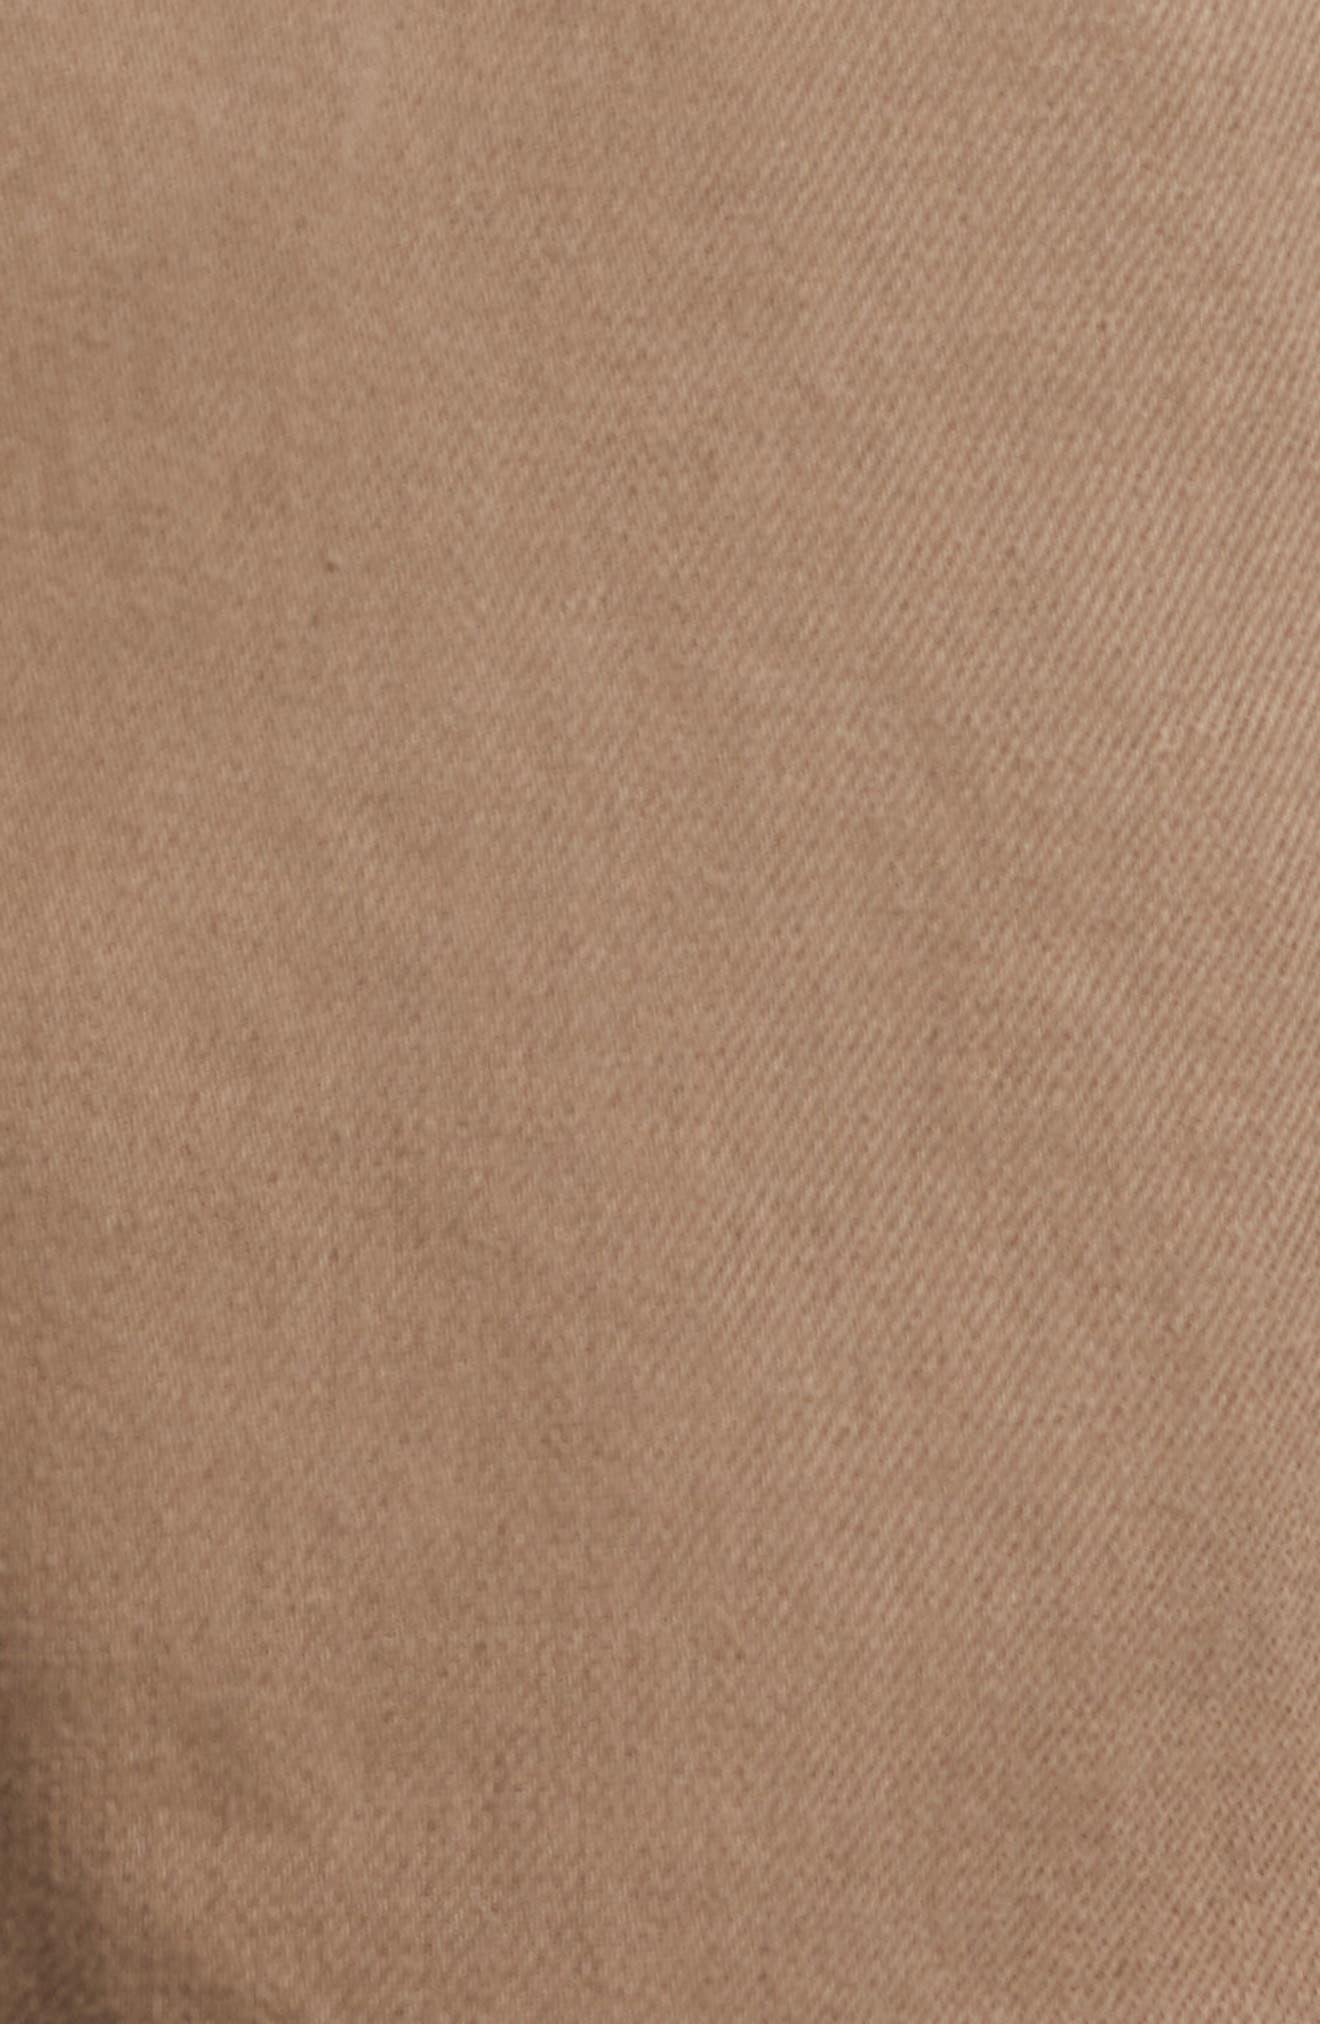 Fatique Bermuda Shorts,                             Alternate thumbnail 5, color,                             Taupe